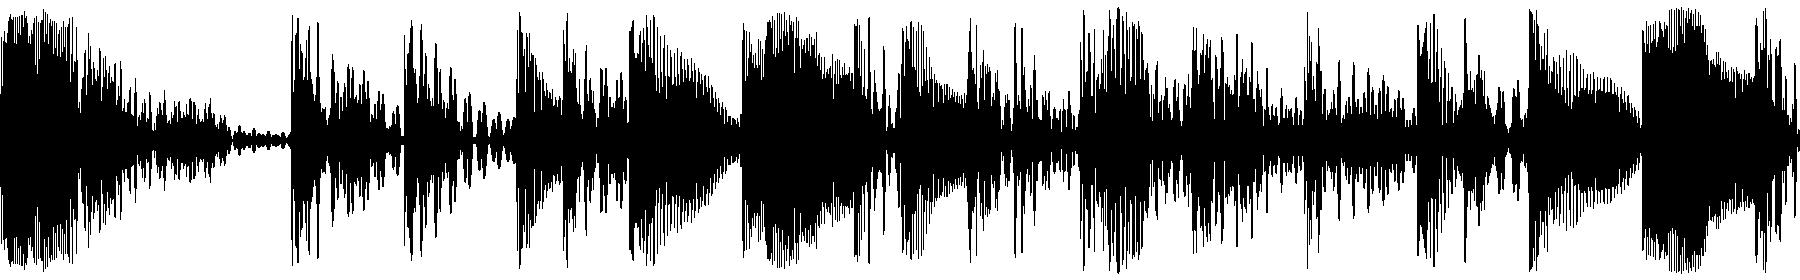 percussive synthloop 125